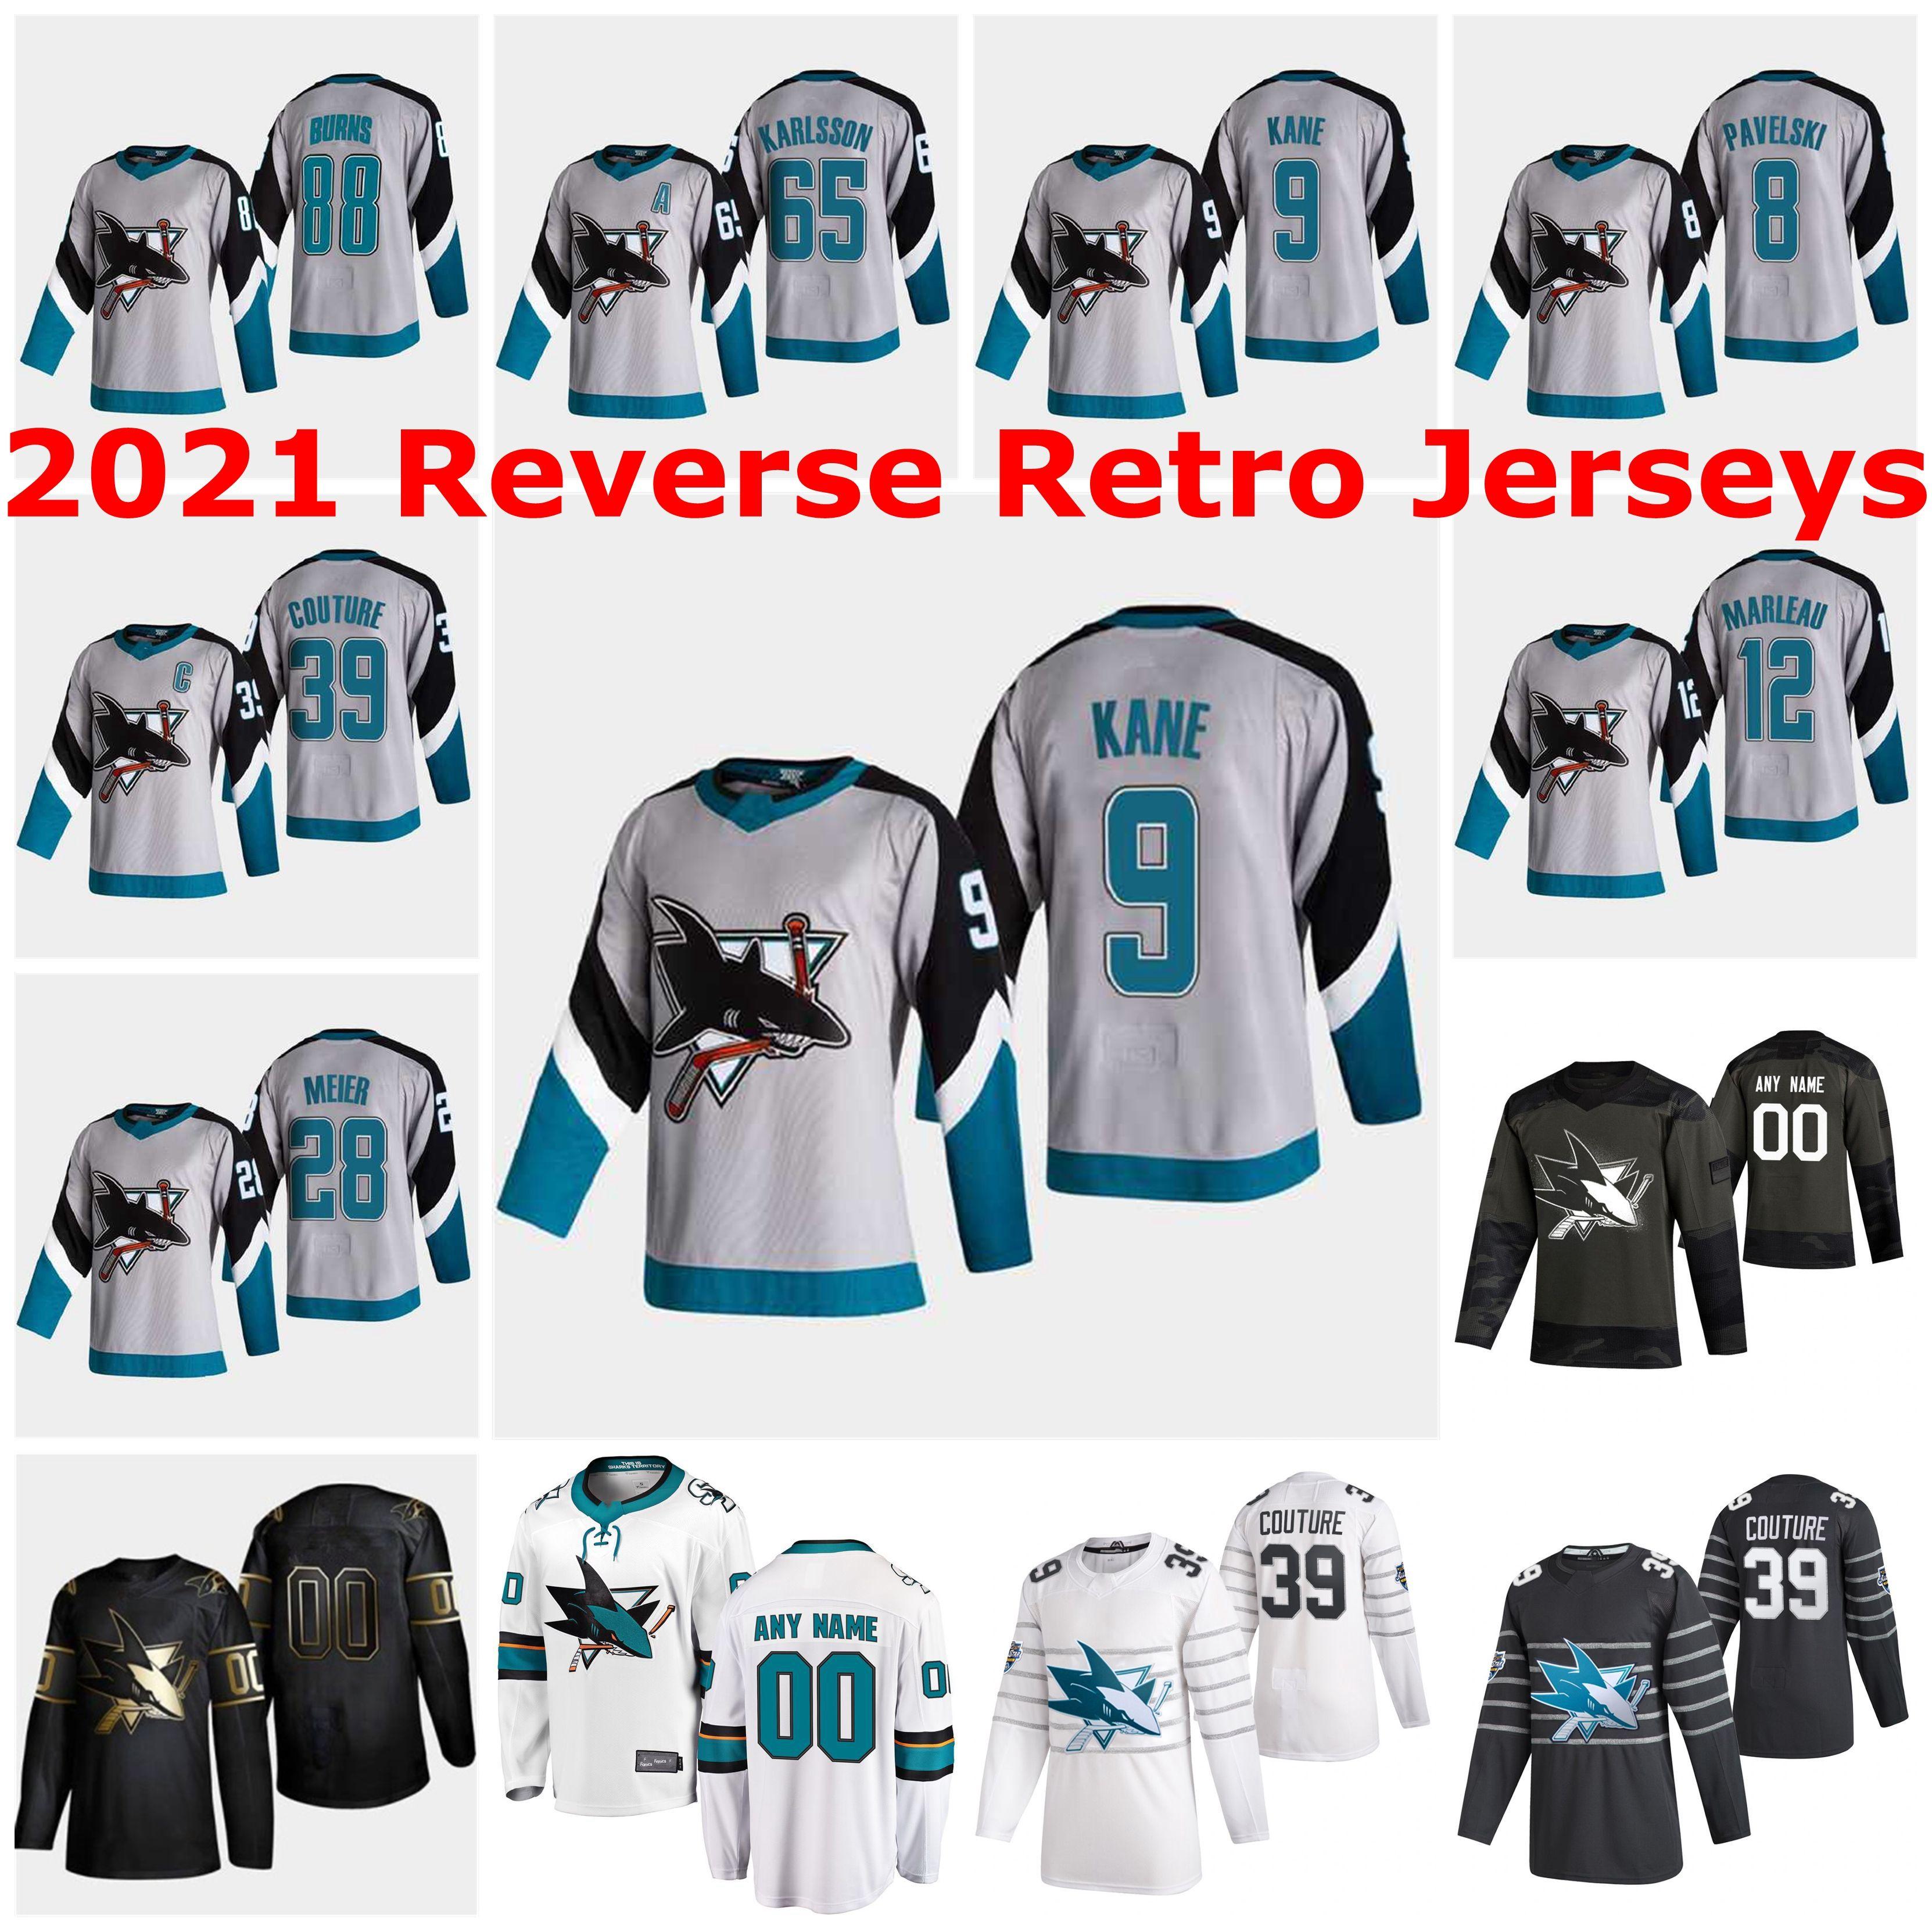 San Jose Sharks 2021 Reverse Retro Jerseys Barclay Goodrow Jersey Noah Gregor Tomas Hertl Evander Kane Melker Karlsson Custom Stitched